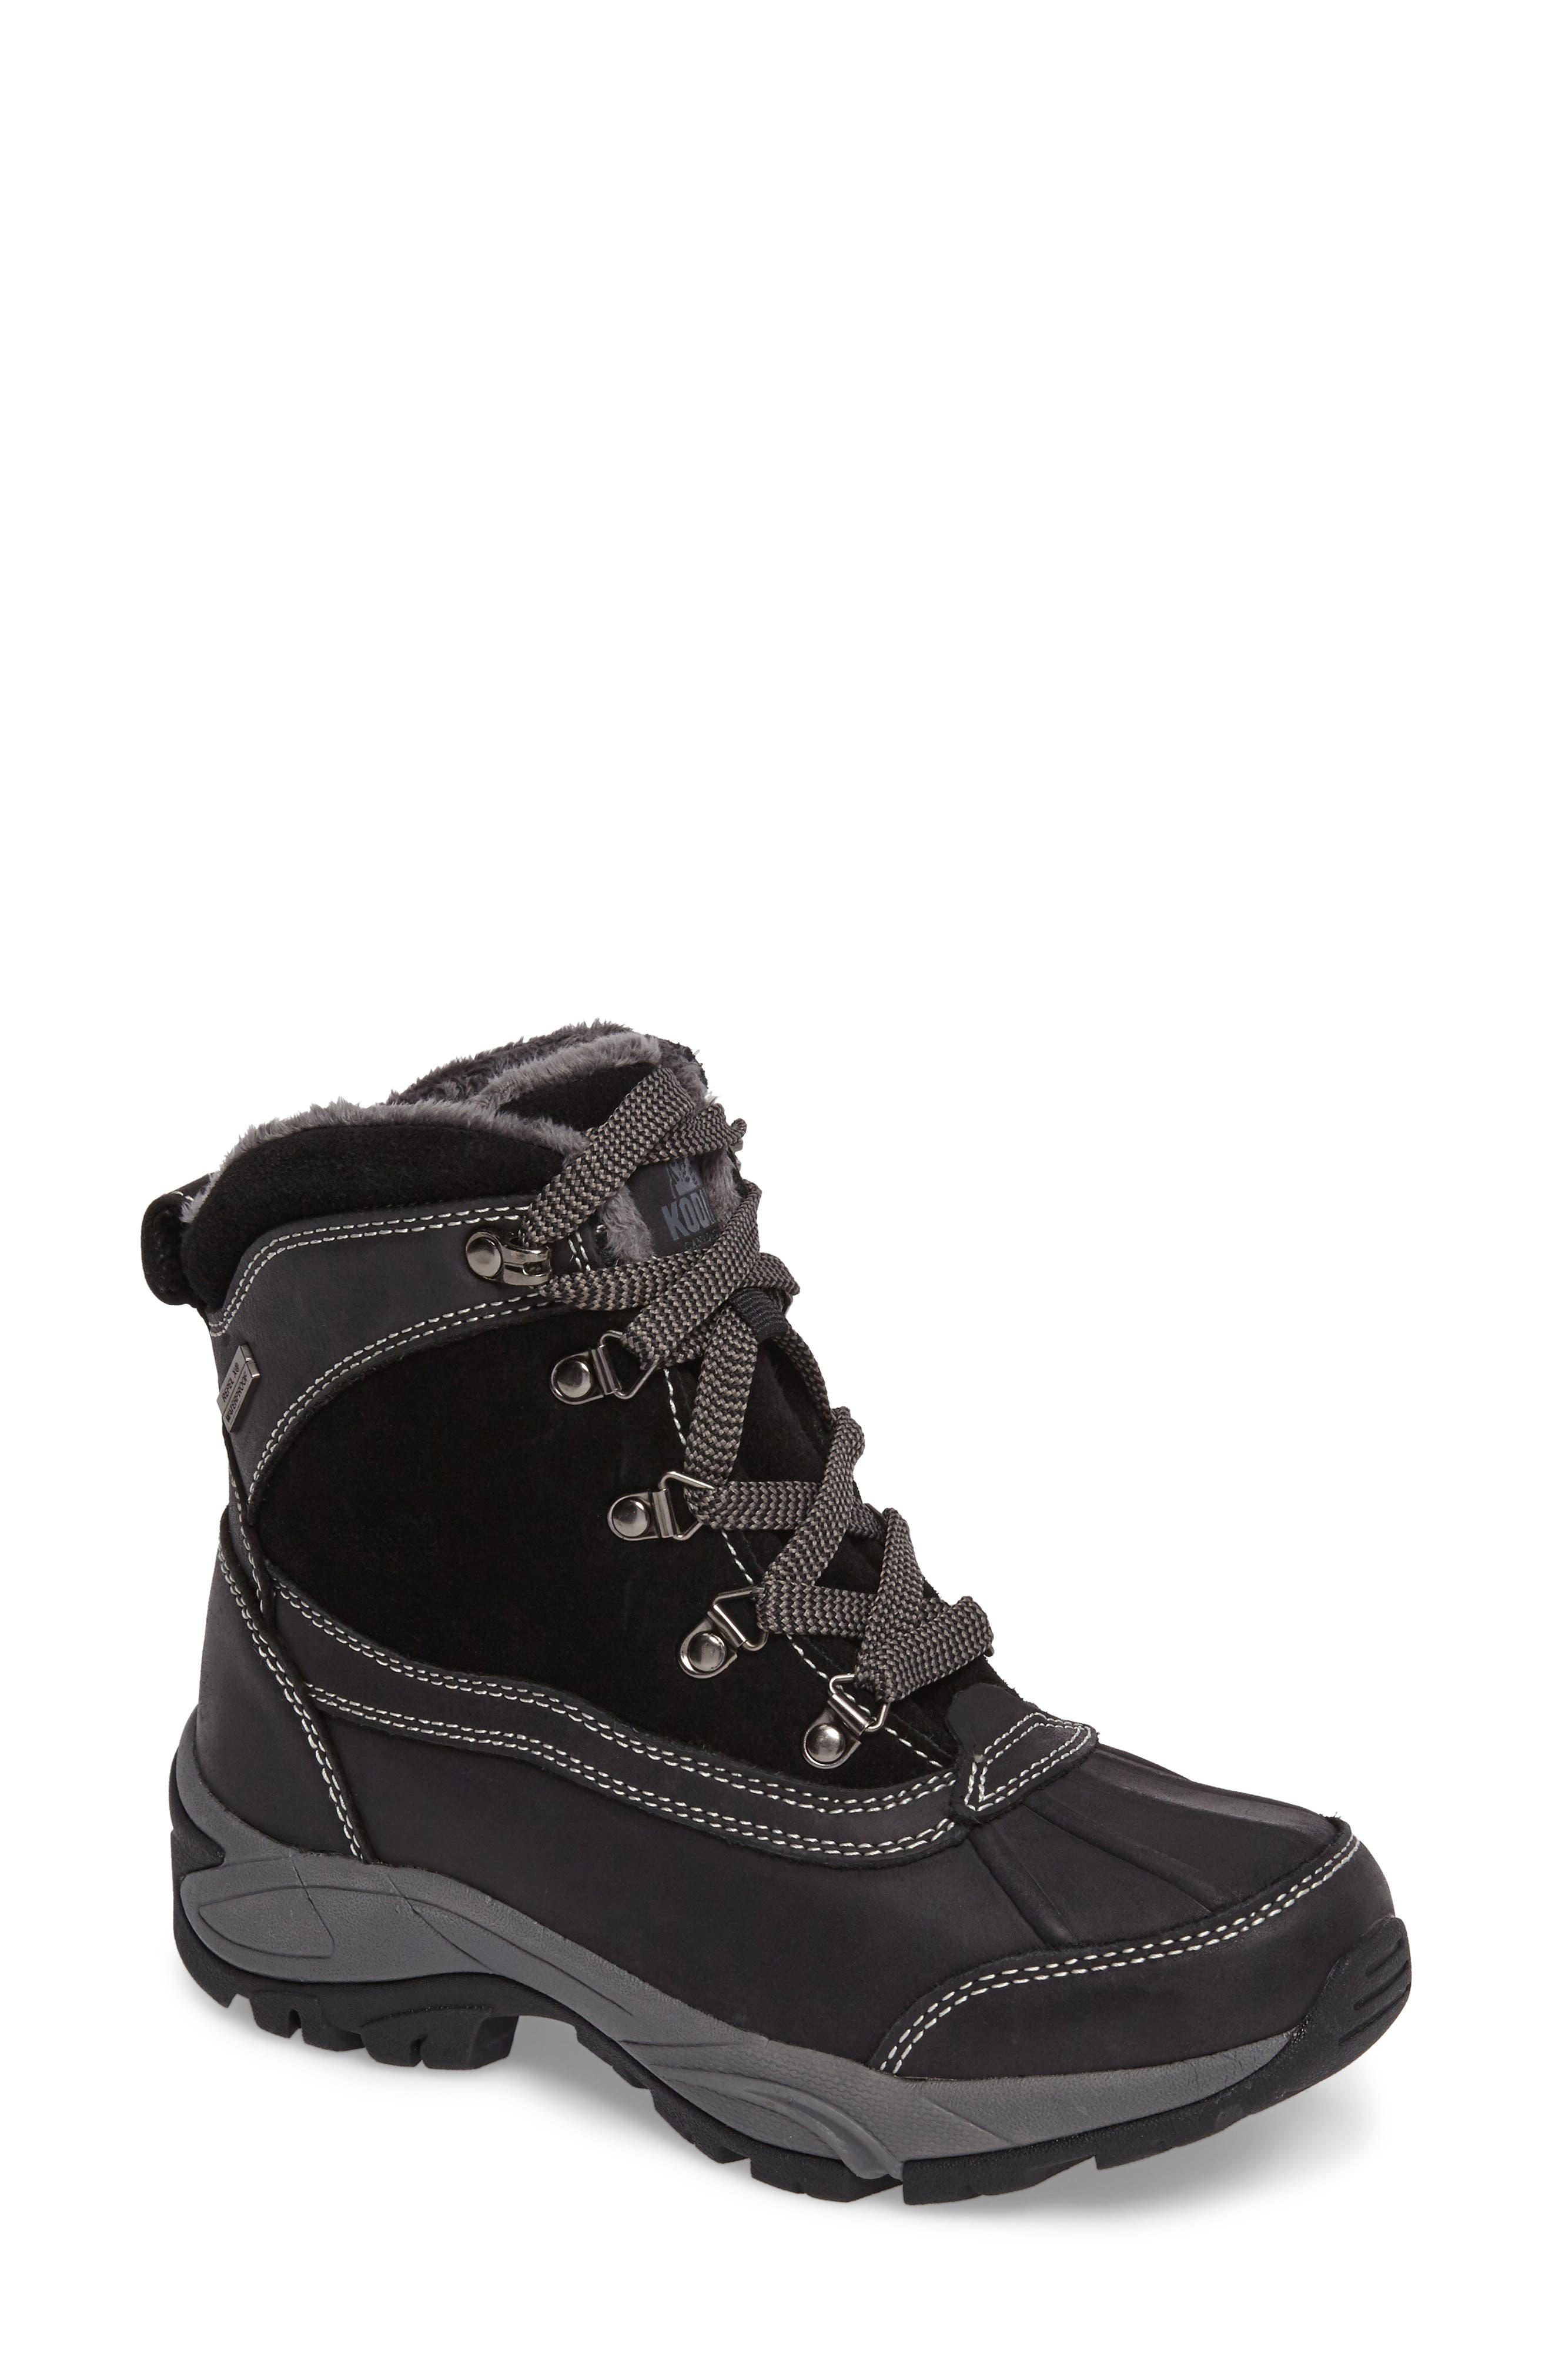 Alternate Image 1 Selected - Kodiak 'Renee' Waterproof Insulated Winter Boot (Women)